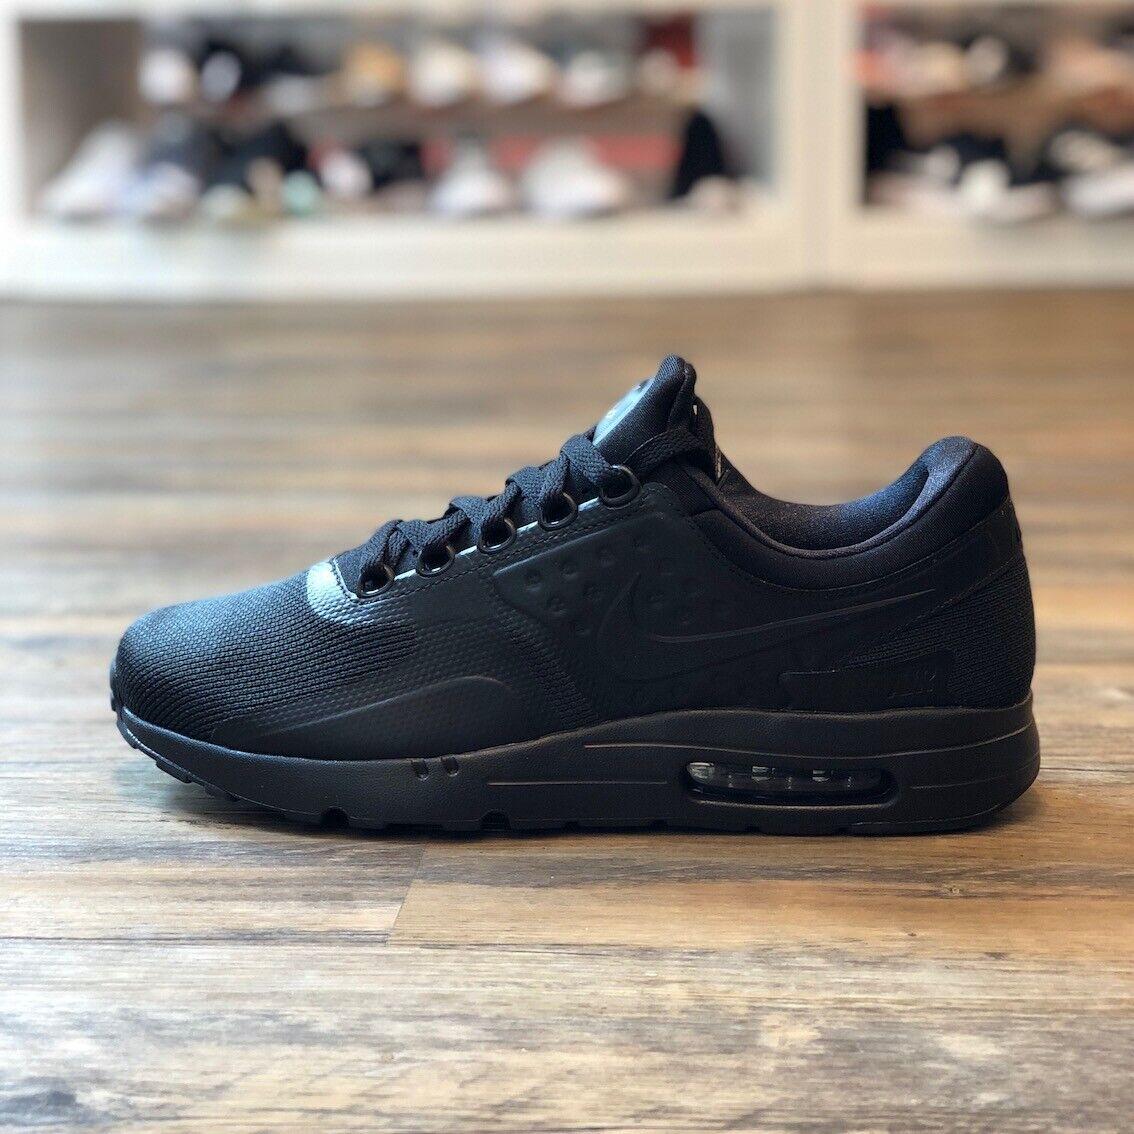 Nike Air Max Zero Essential Gr.41 Schuhe Turnschuhe Turn schwarz Neu 876070 006